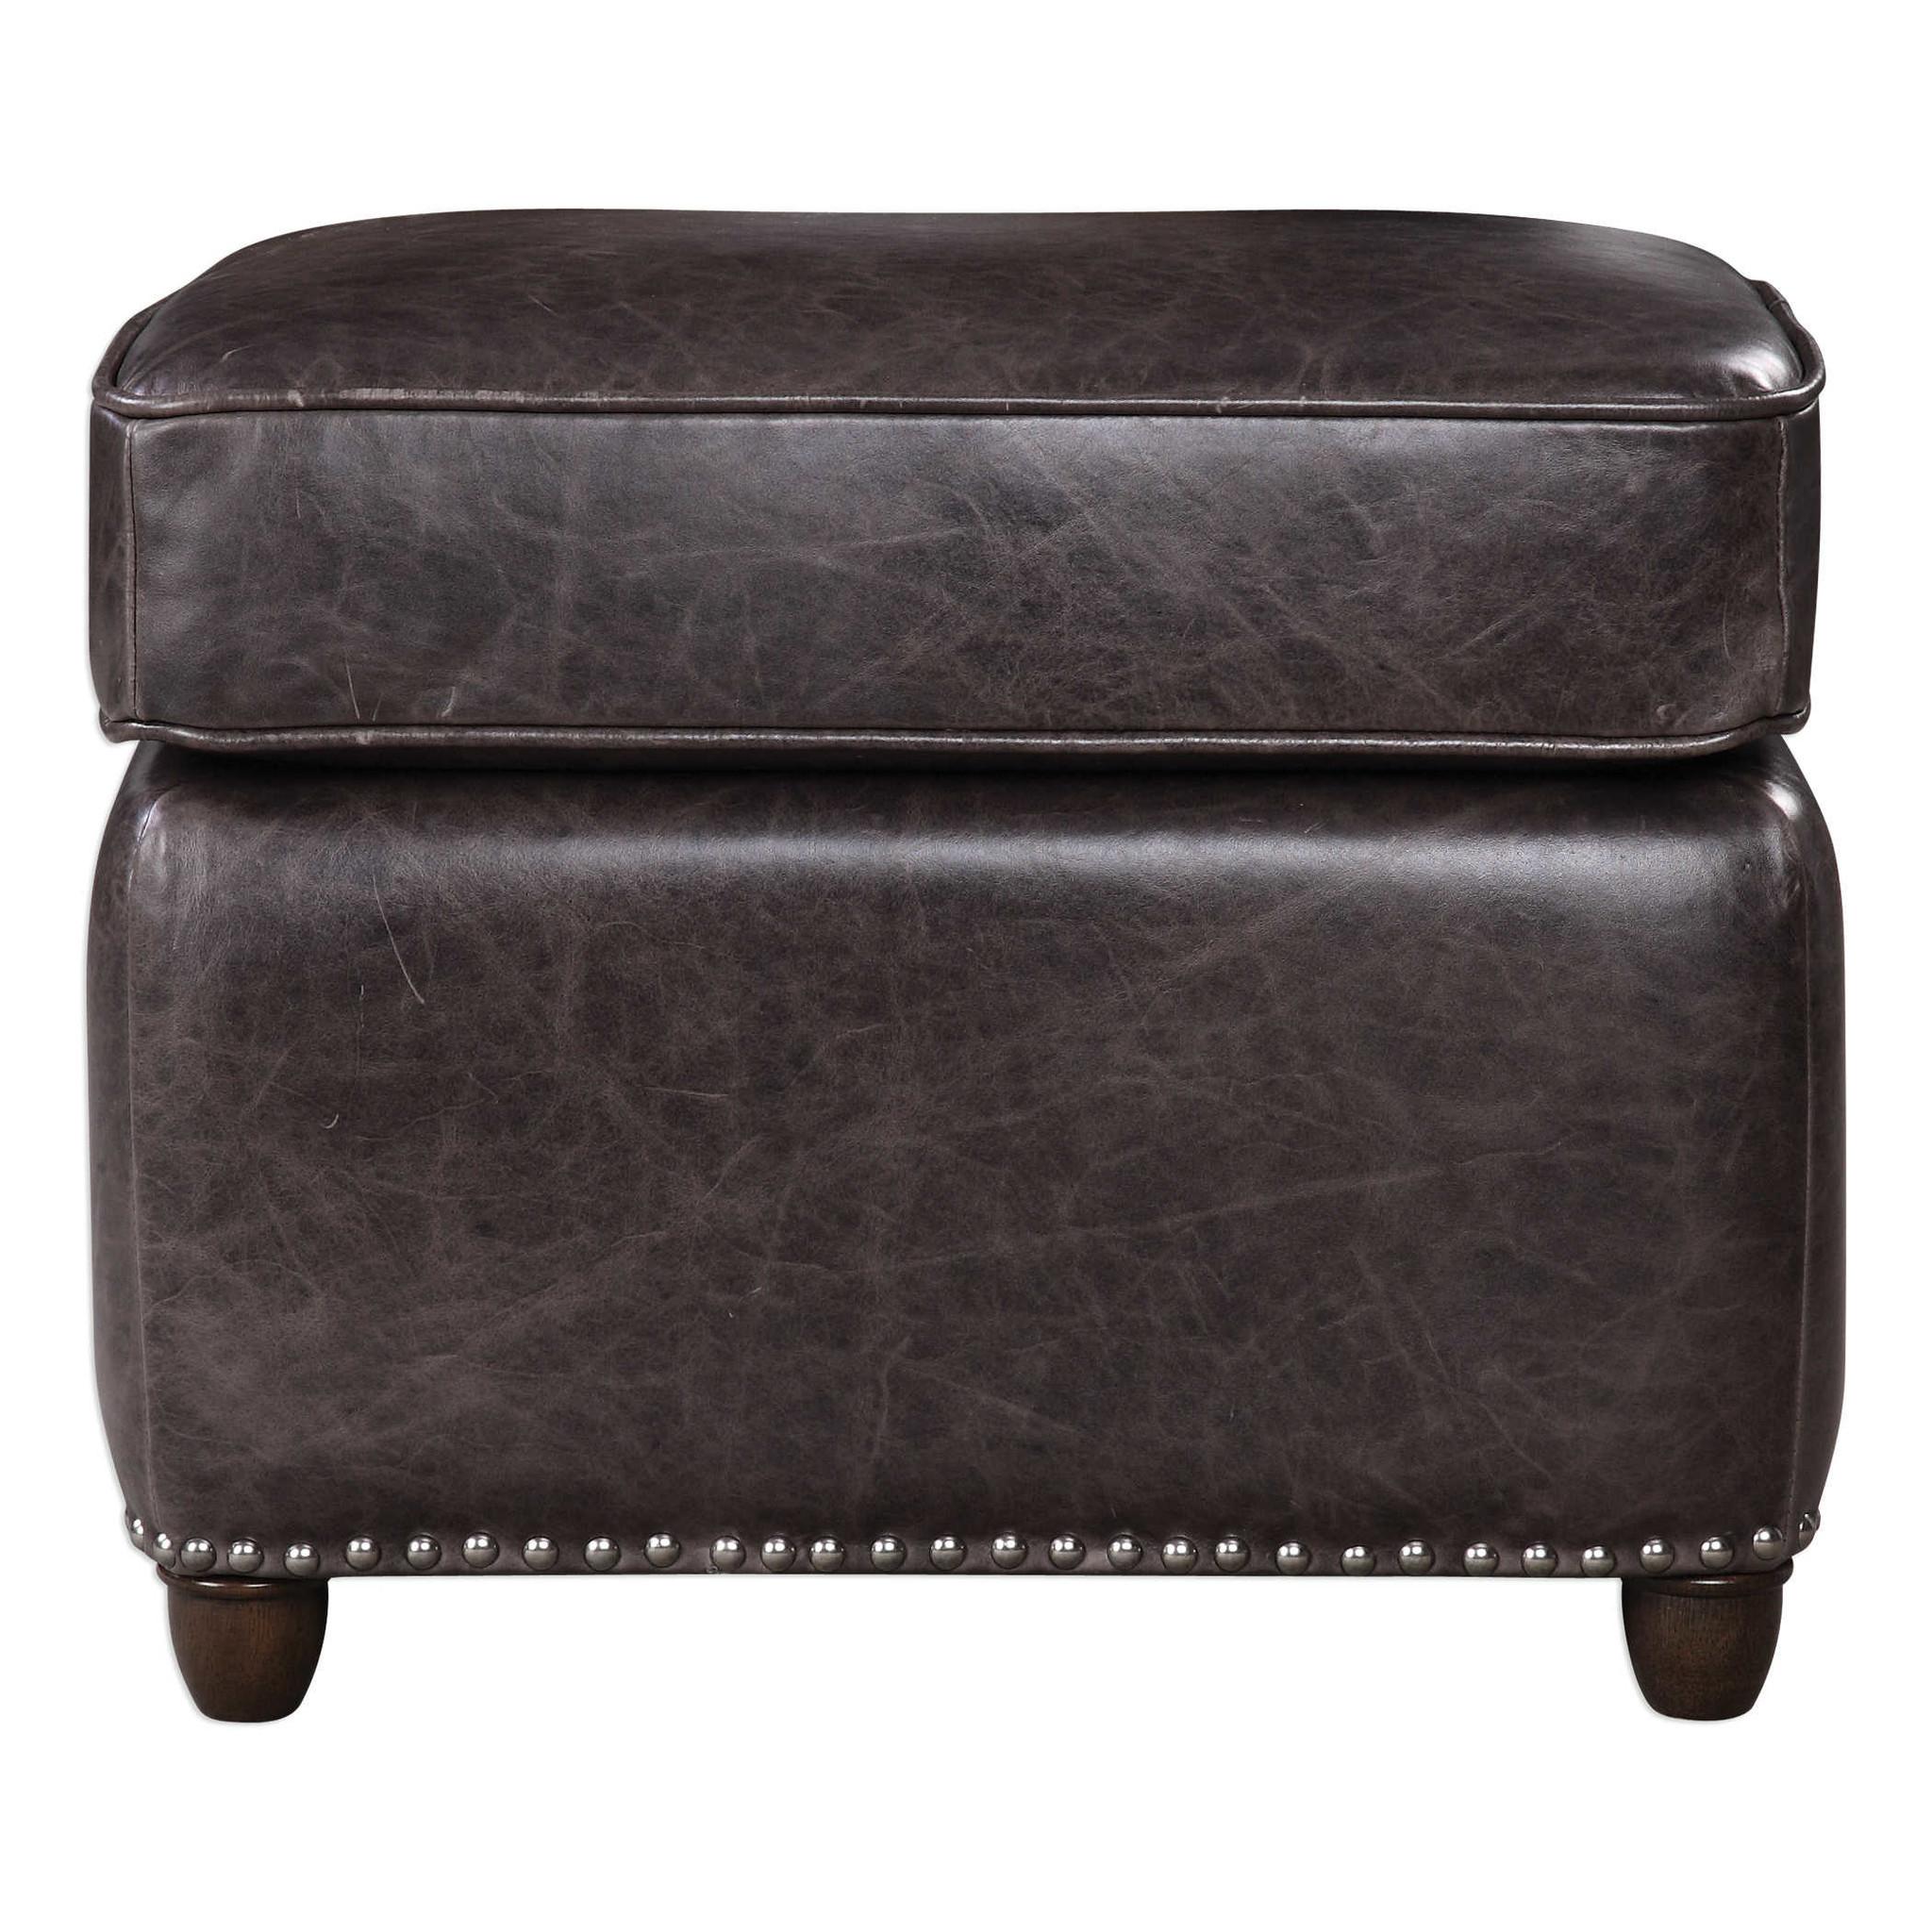 Roosevelt Leather Ottoman -Smoke